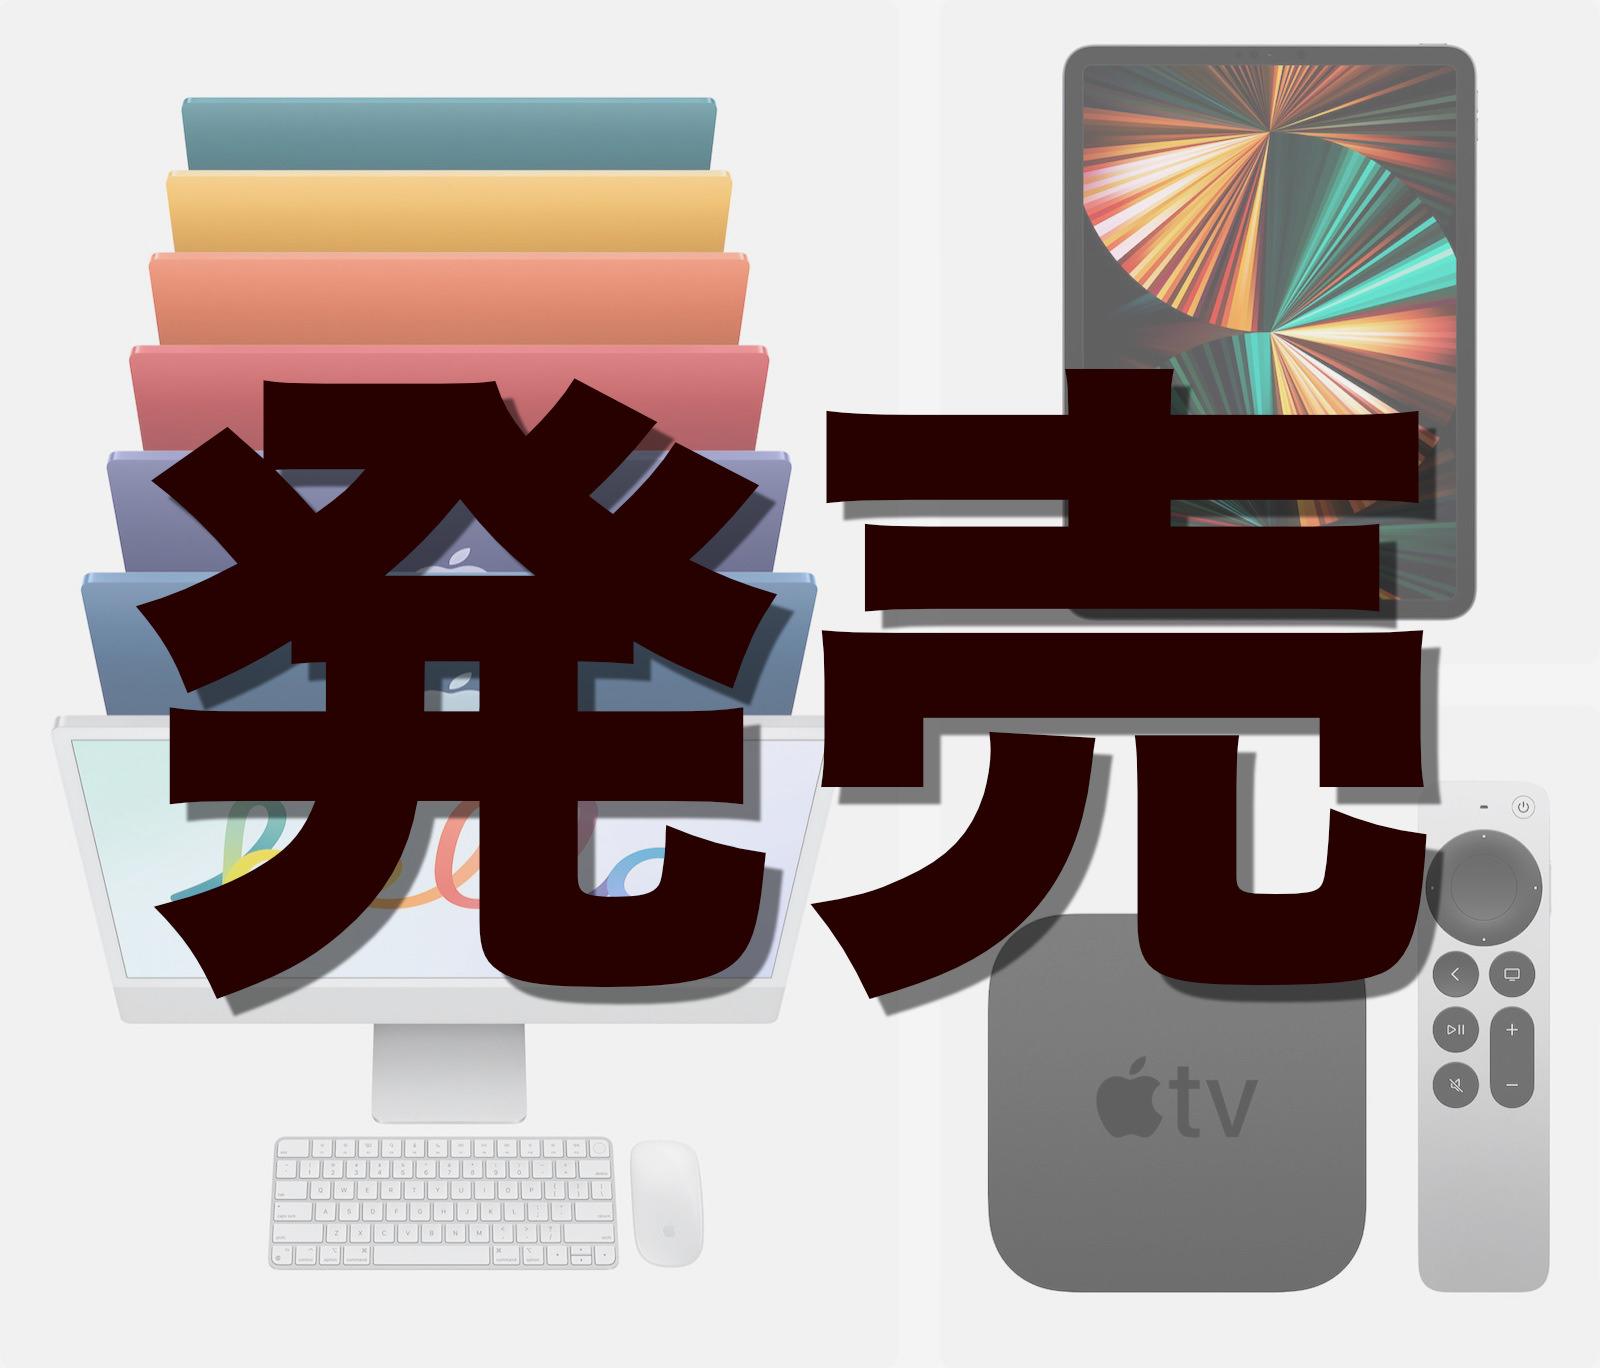 Apple iMac iPadPro AppleTV4K in stores now